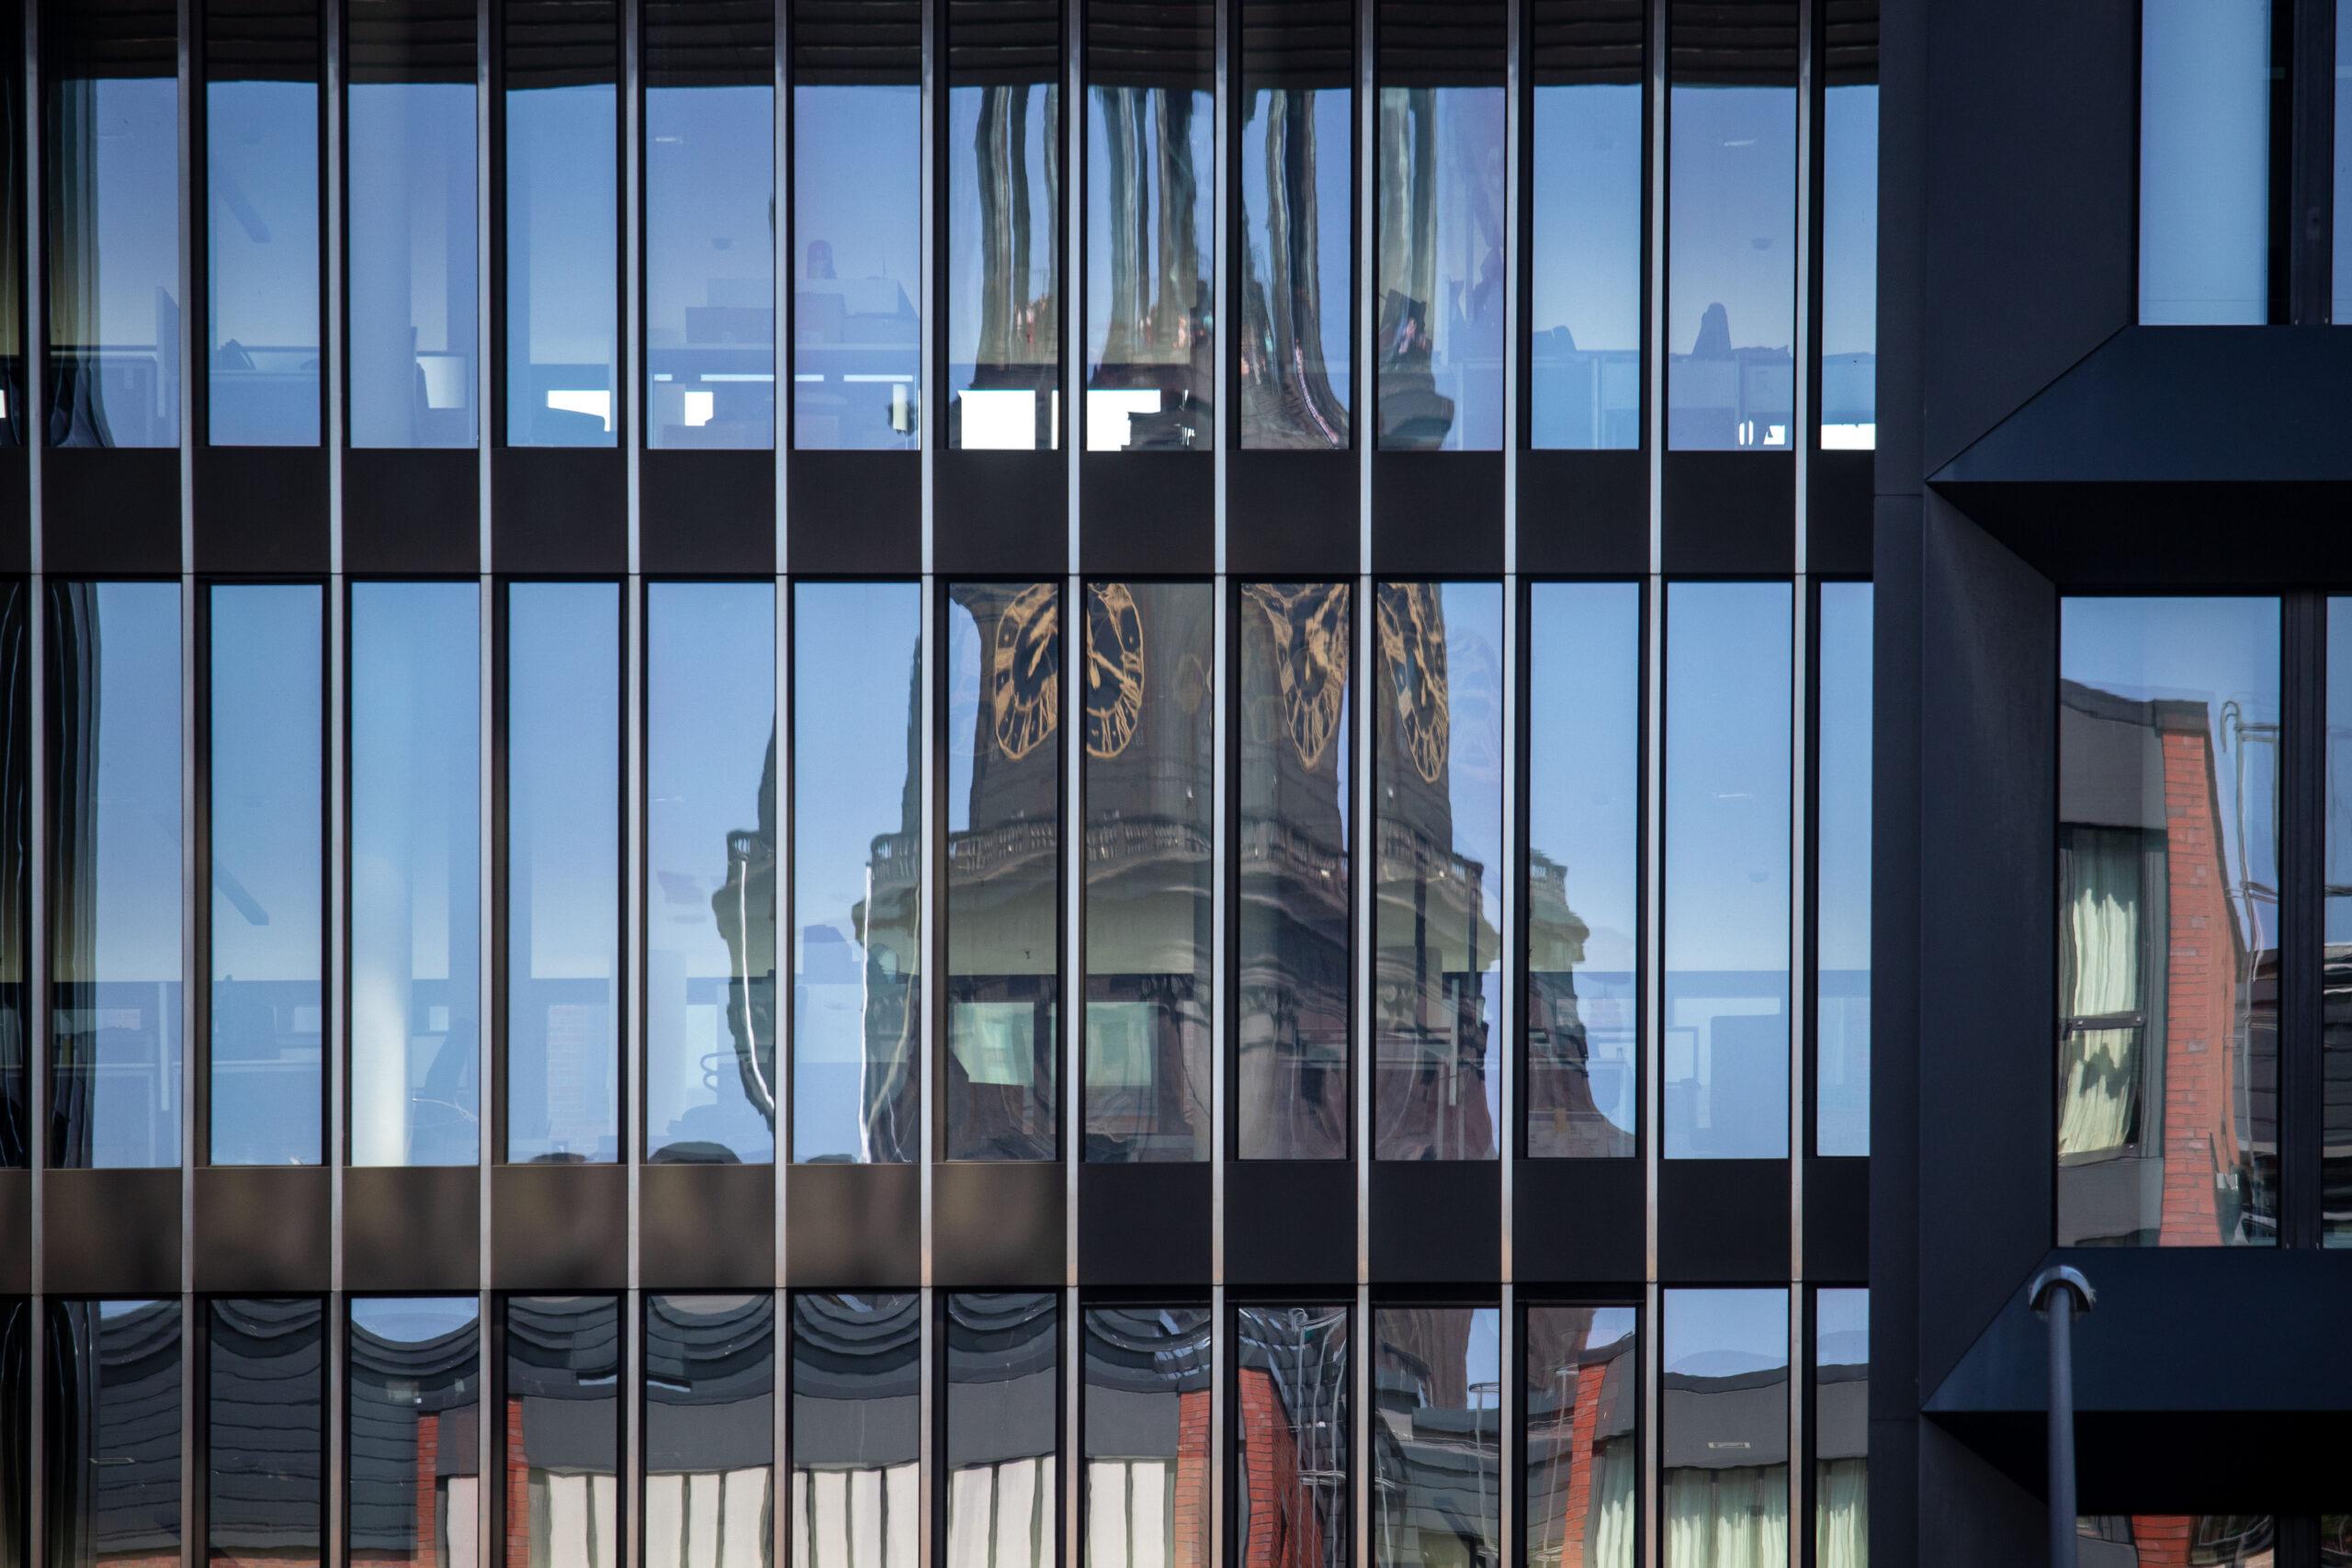 Bodo Jarren - Fleete Tour 25.07.2021 - Spiegelmichel